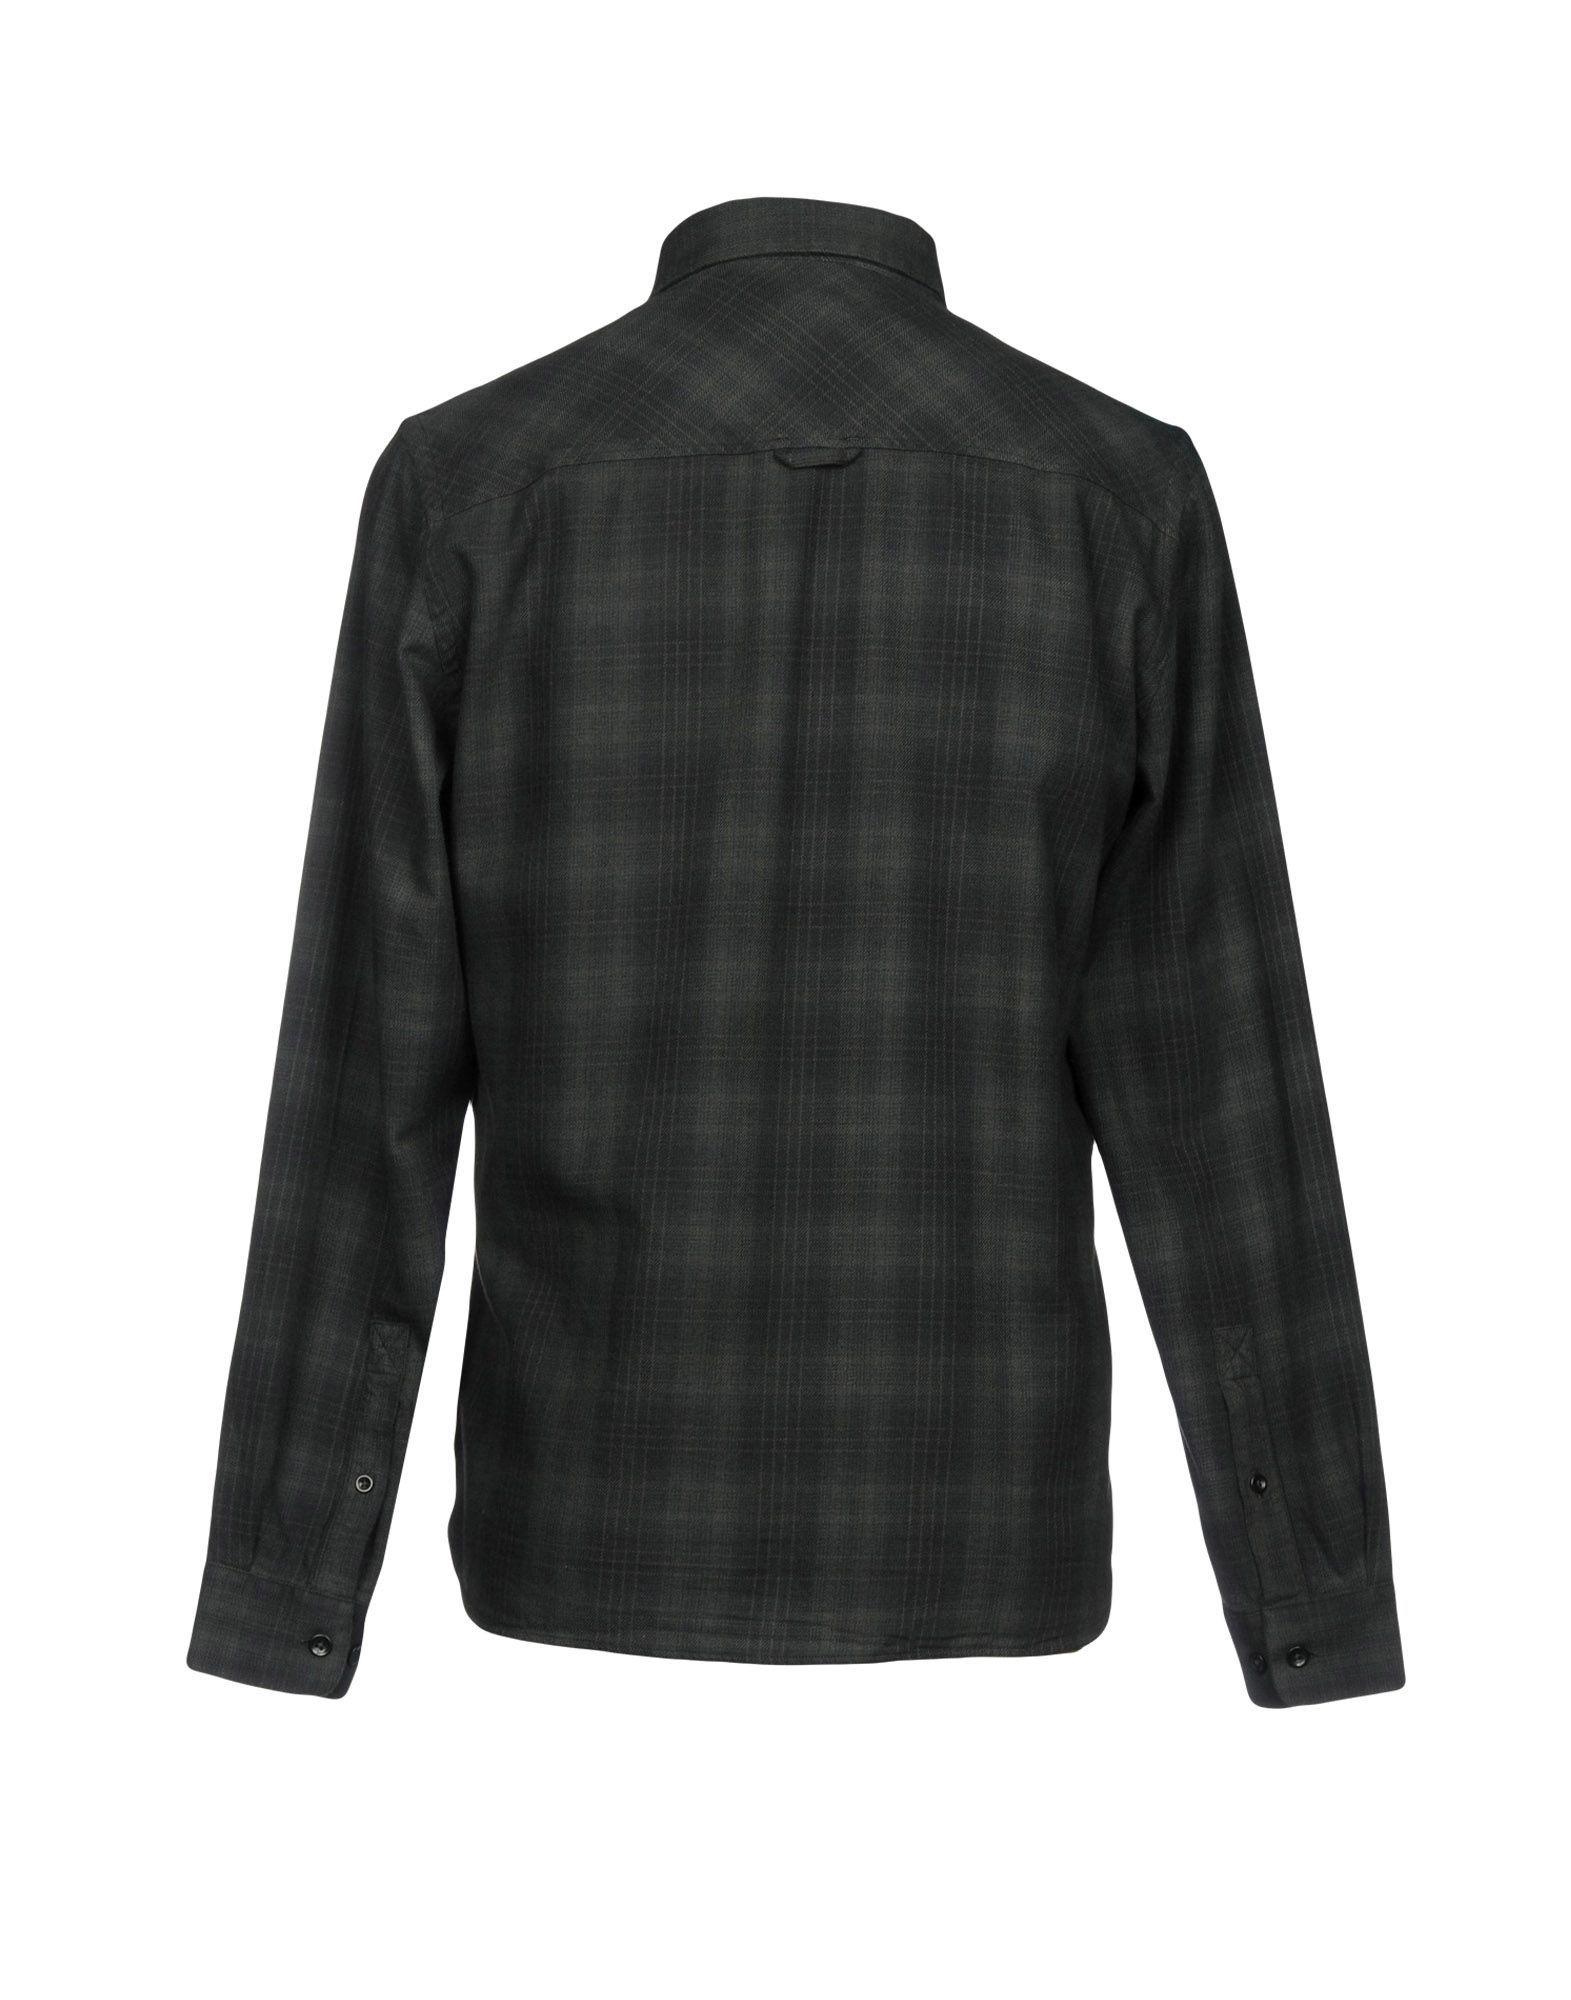 Whistles Dark Green Plaid Cotton Shirt